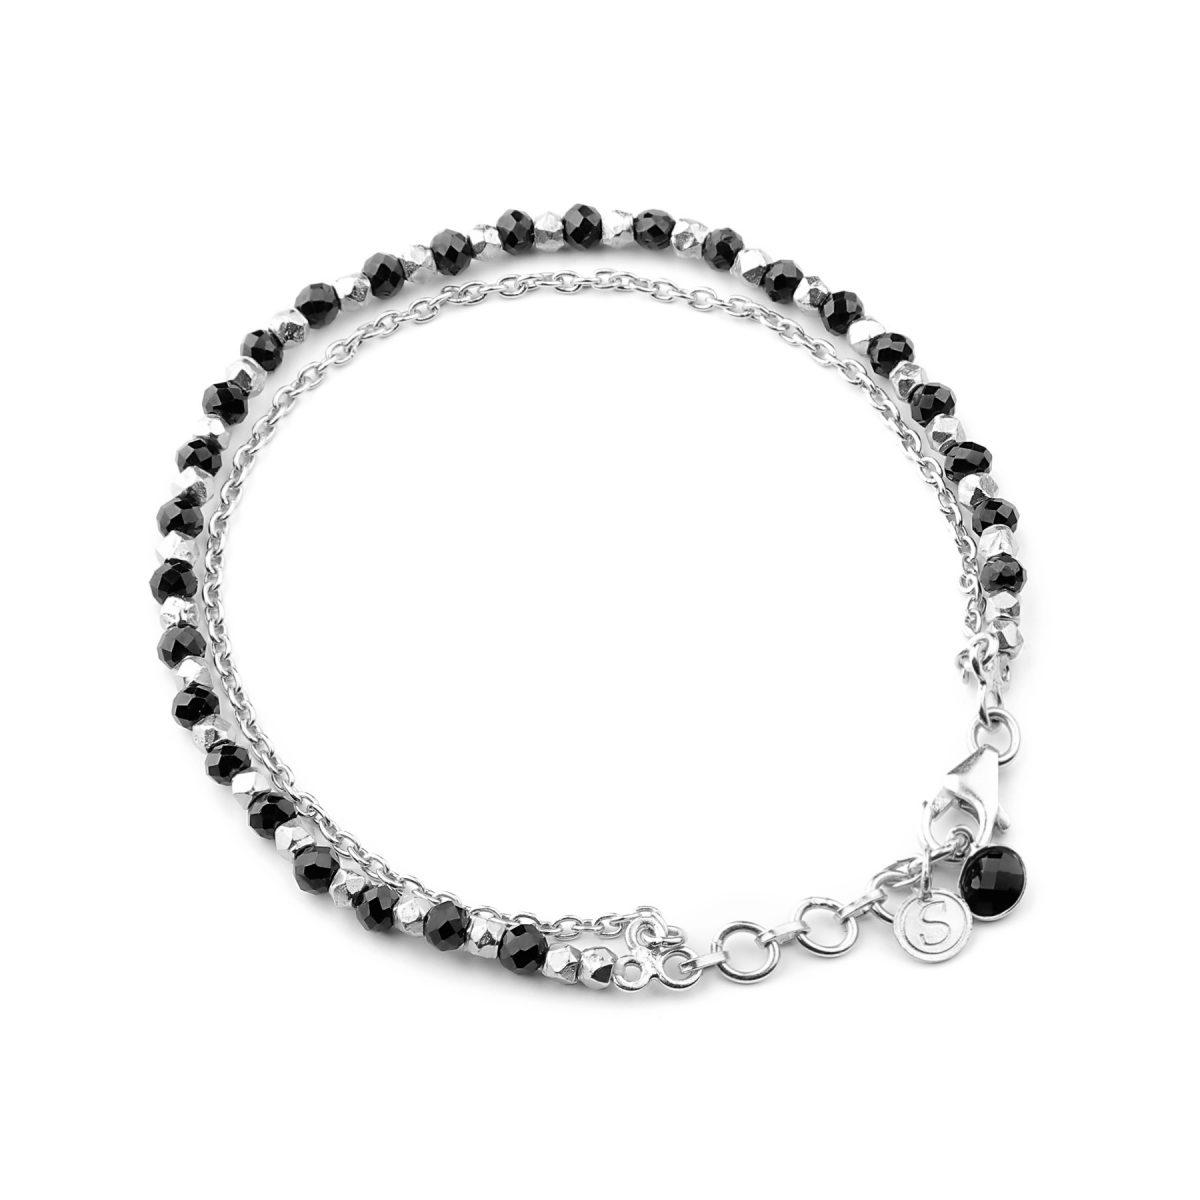 Black Spinel beaded friendship bracelet in silver.